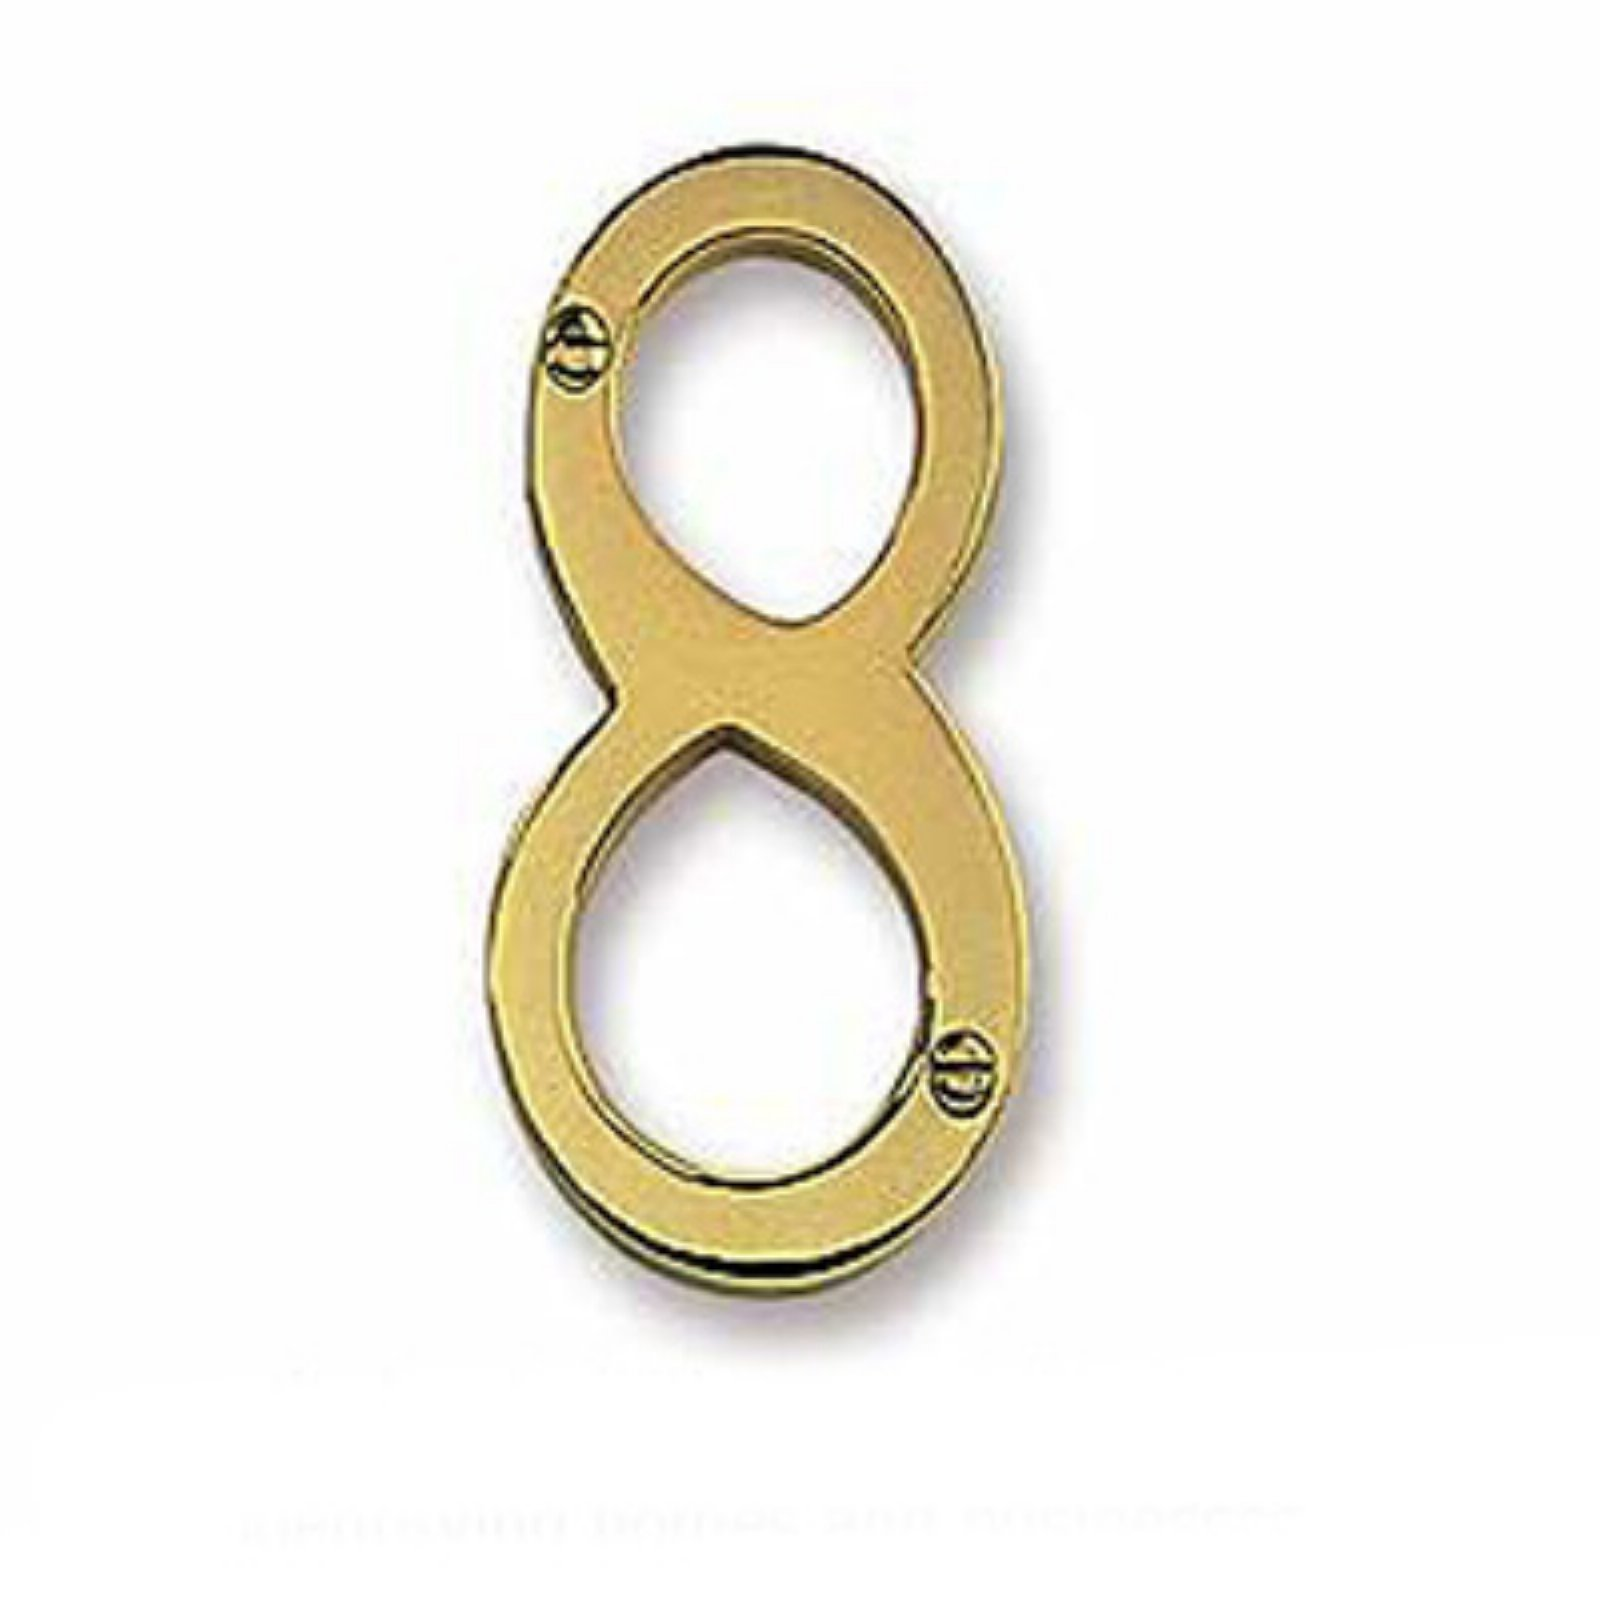 Salsbury Solid Brass Number